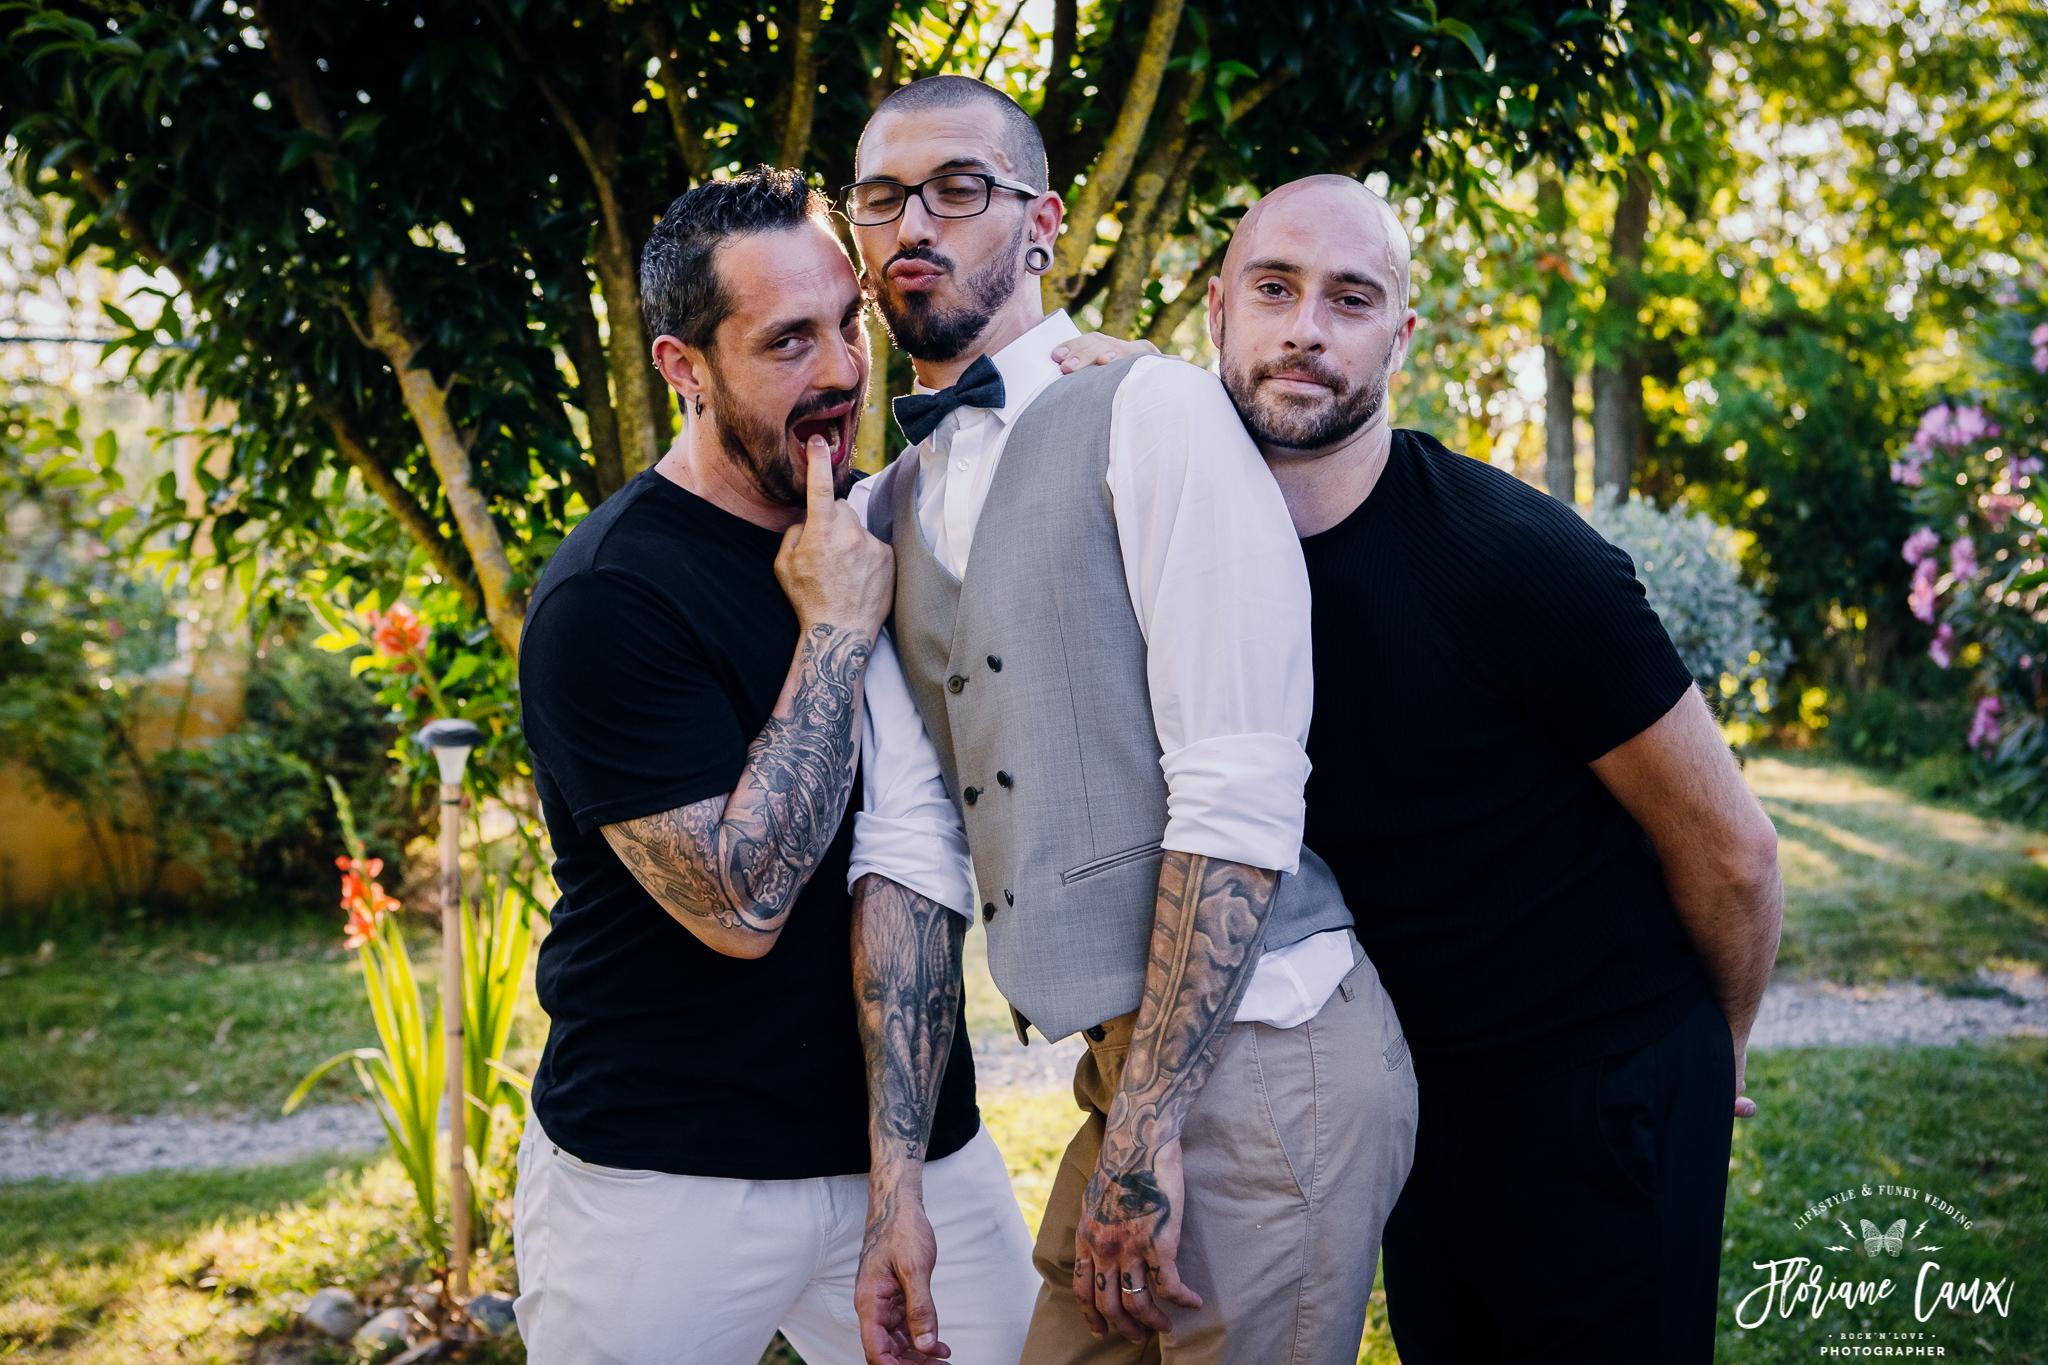 photographe-mariage-toulouse-rocknroll-maries-tatoues-floriane-caux-109